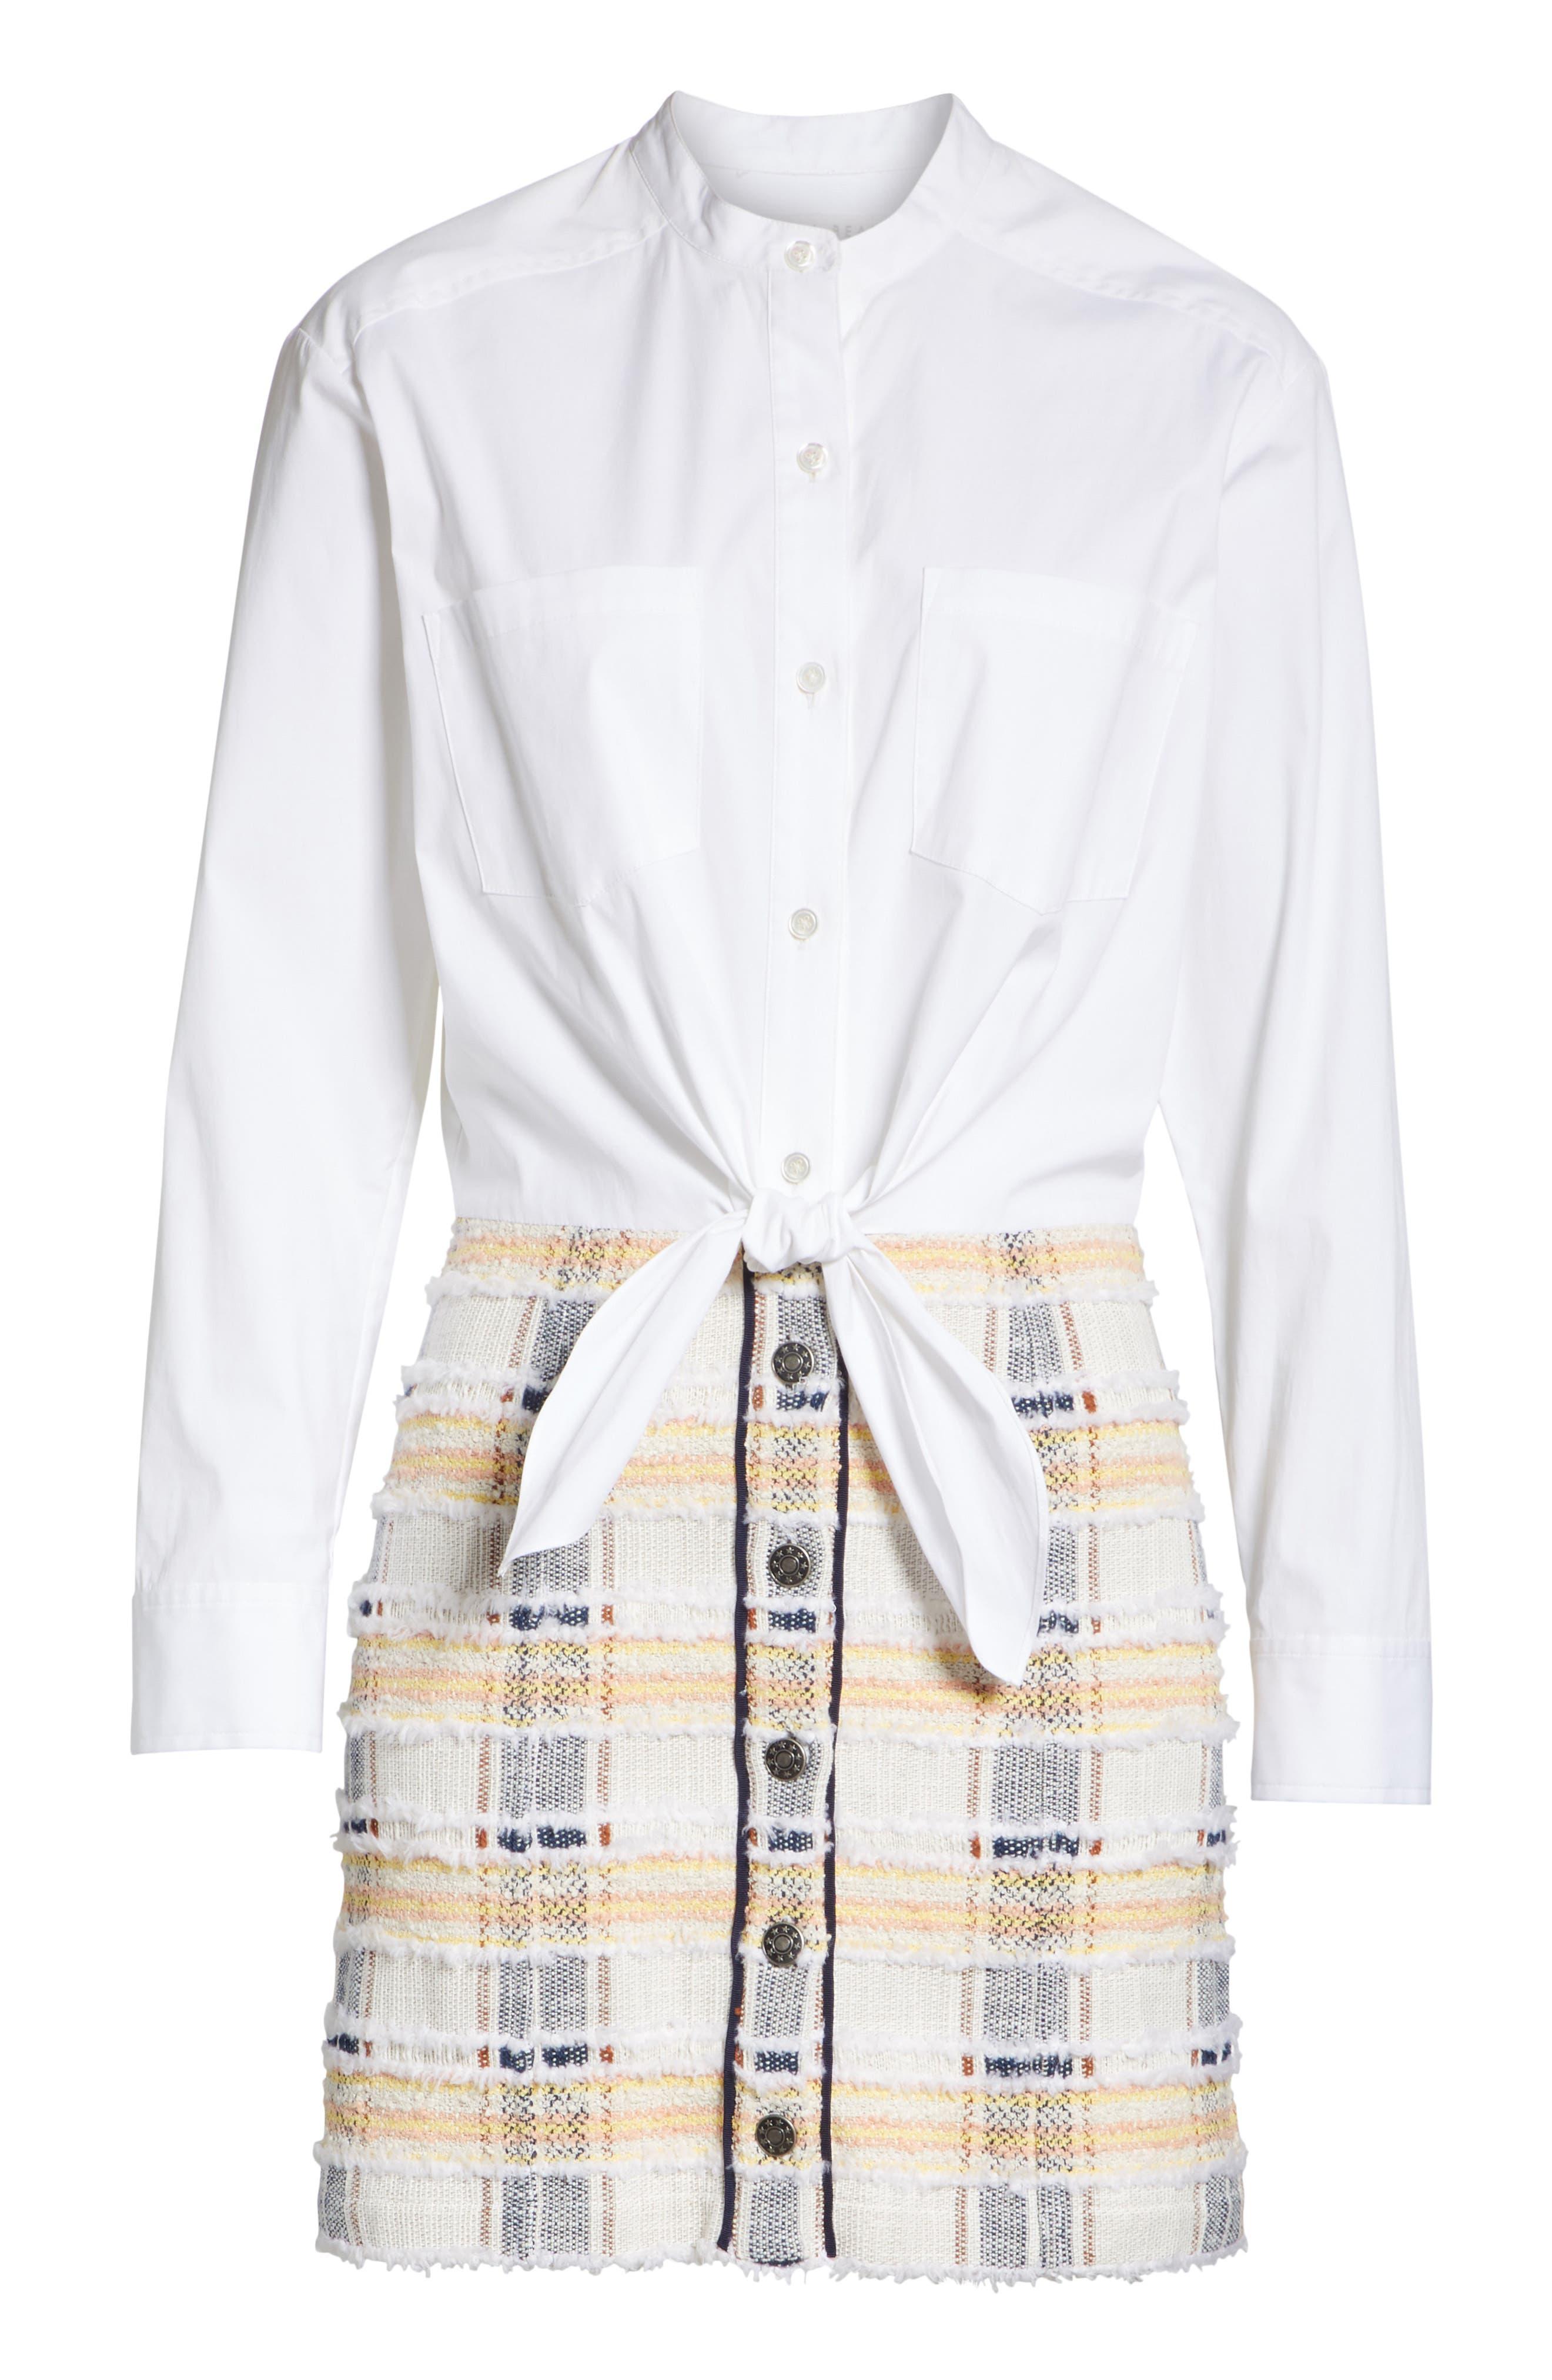 Aurelia Mixed Media Shirtdress,                             Alternate thumbnail 6, color,                             Off-White/ Navy/ Rust/ Yellow